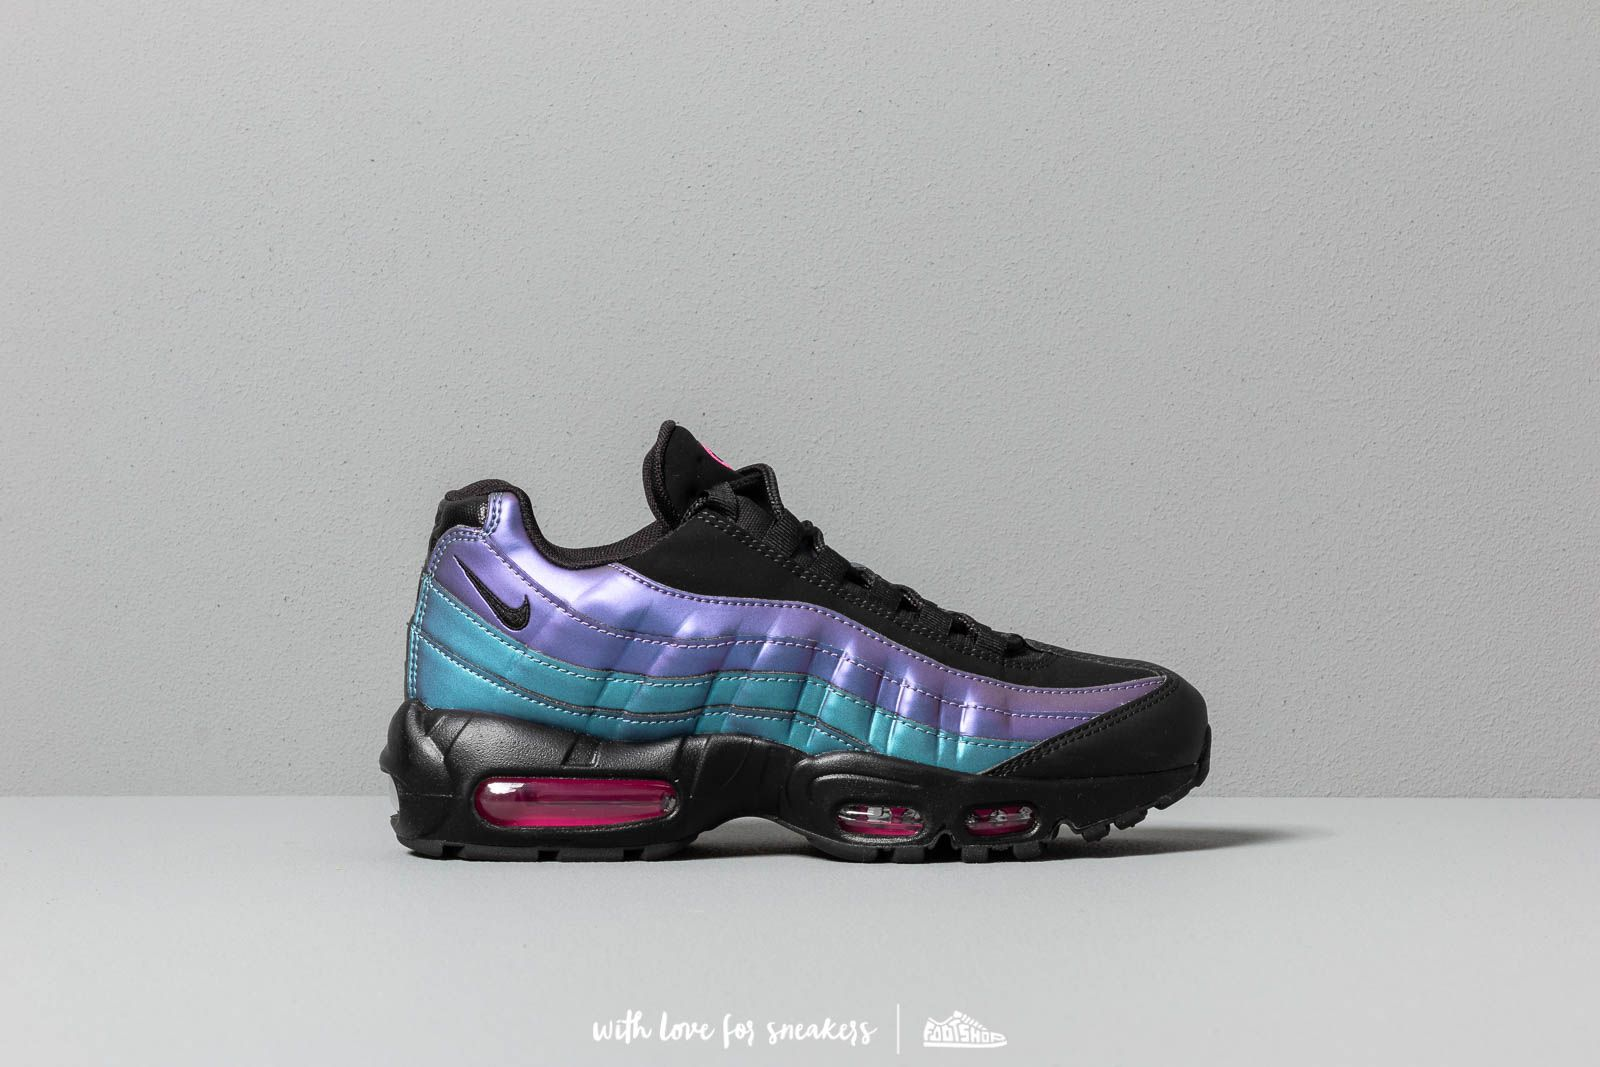 Buty Nike Air Max 95 Premium (blackblack laser fuchsia)